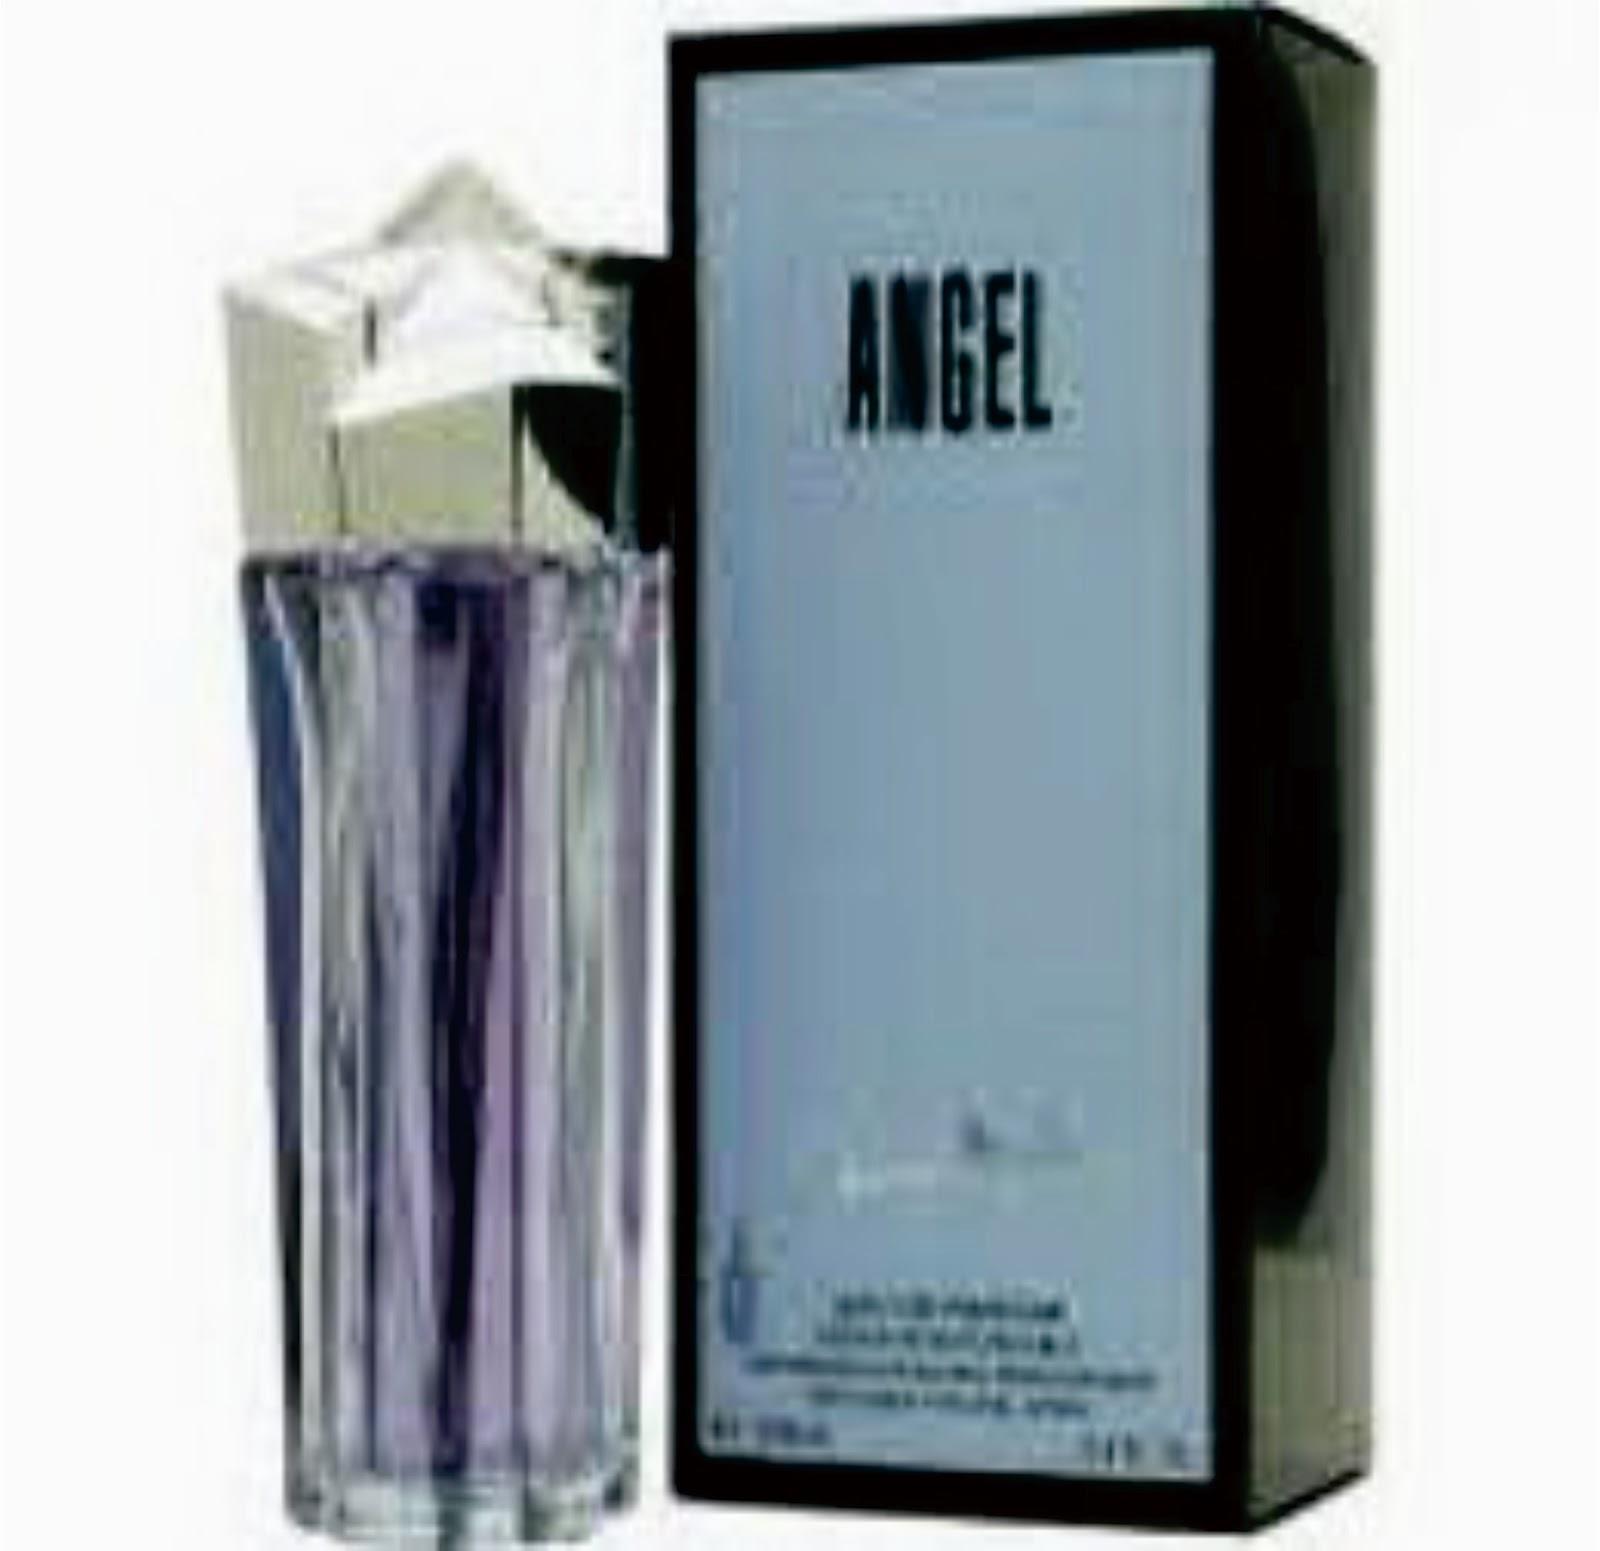 angel by thierry mugler katalog parfum. Black Bedroom Furniture Sets. Home Design Ideas